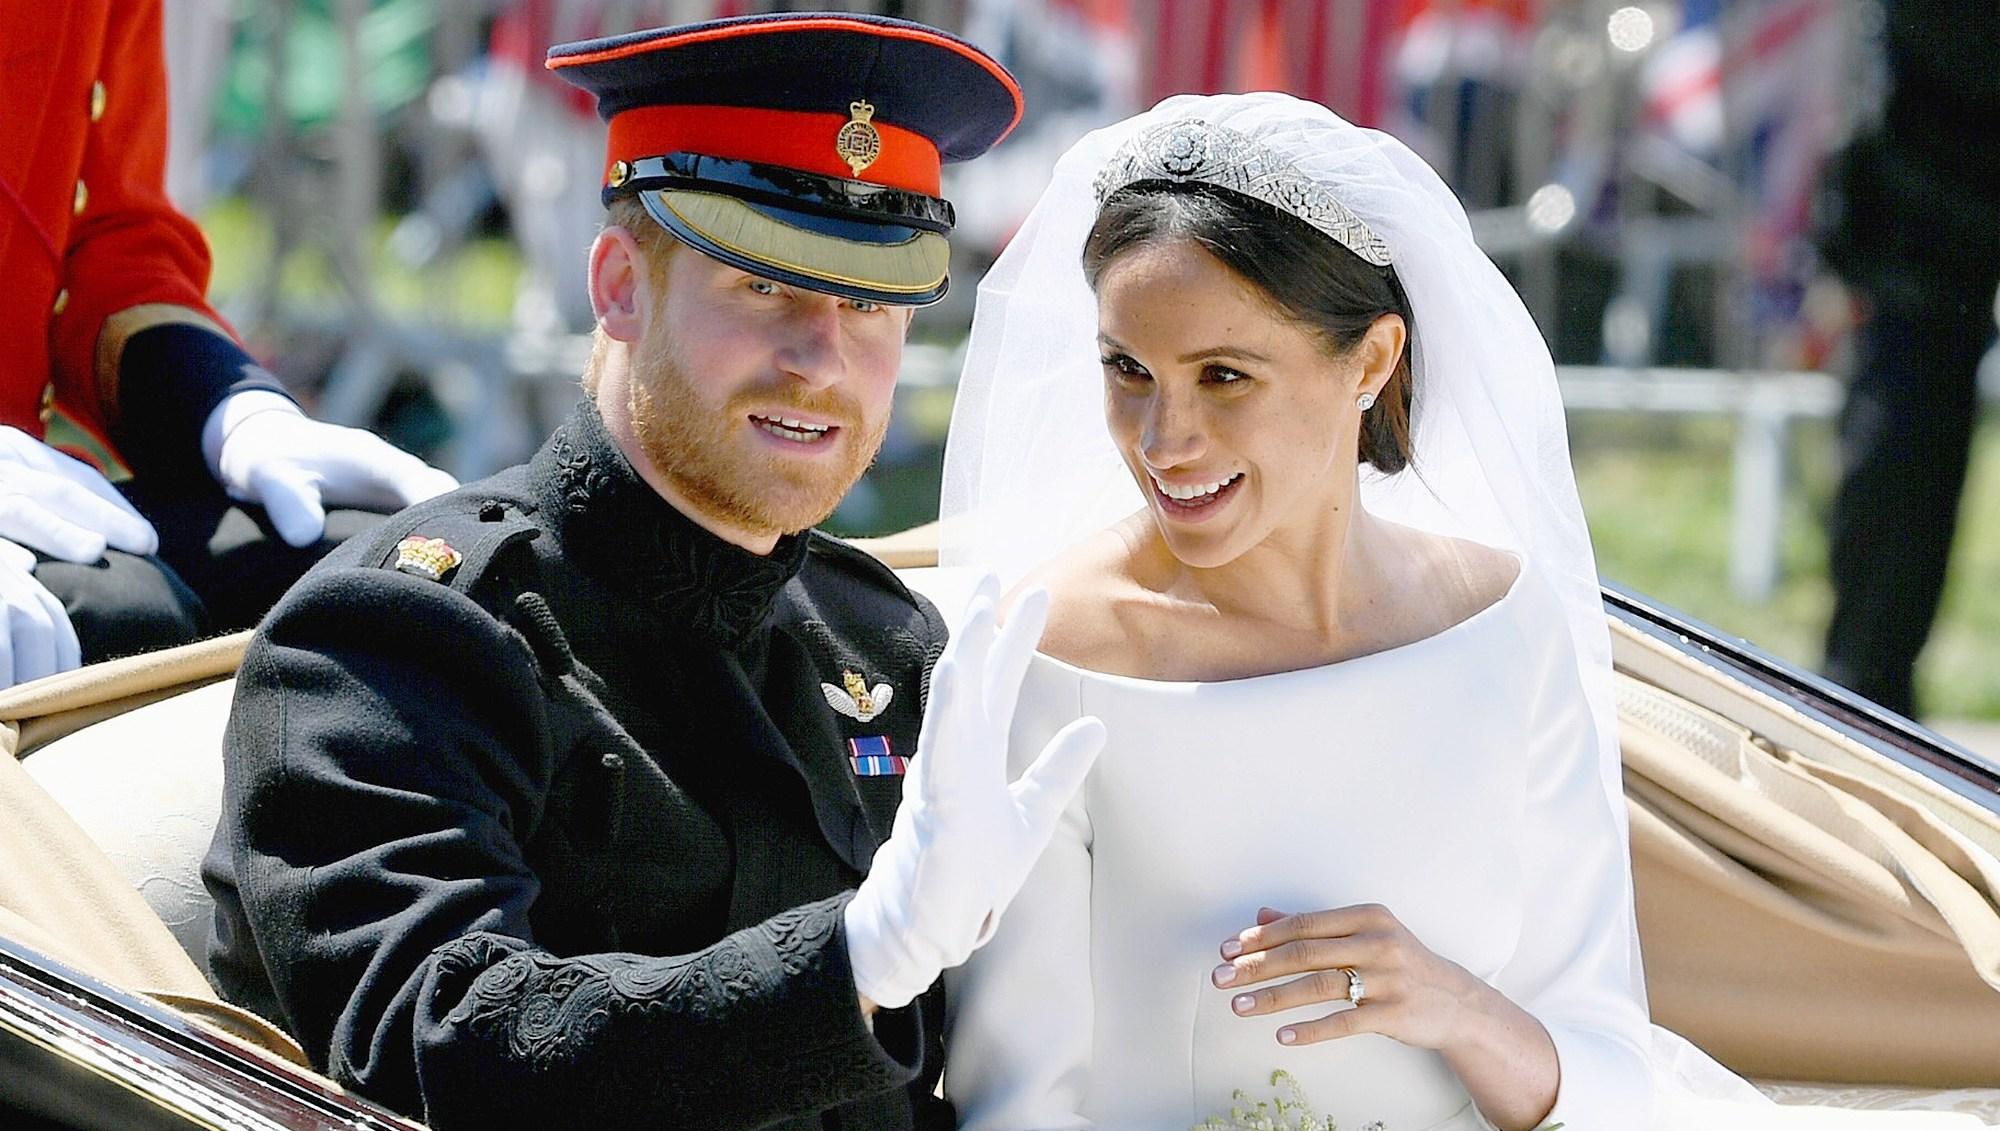 Prince Harry, Duchess Meghan Markle, Royal Wedding, Carriage